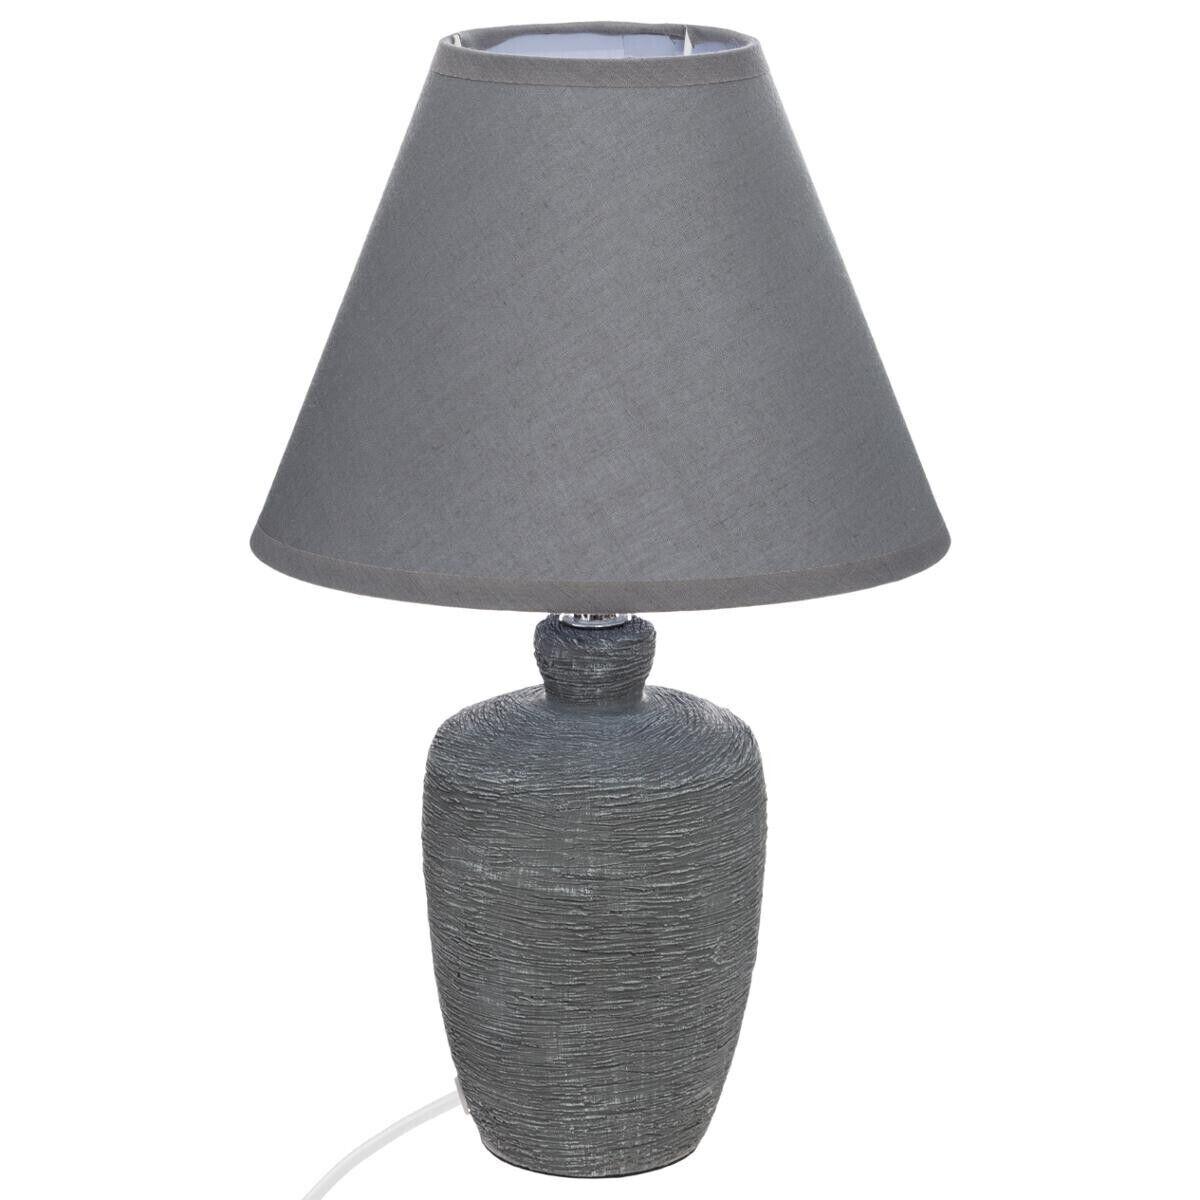 Atmosphera Lampe 'Balvy', céramique H32 cm